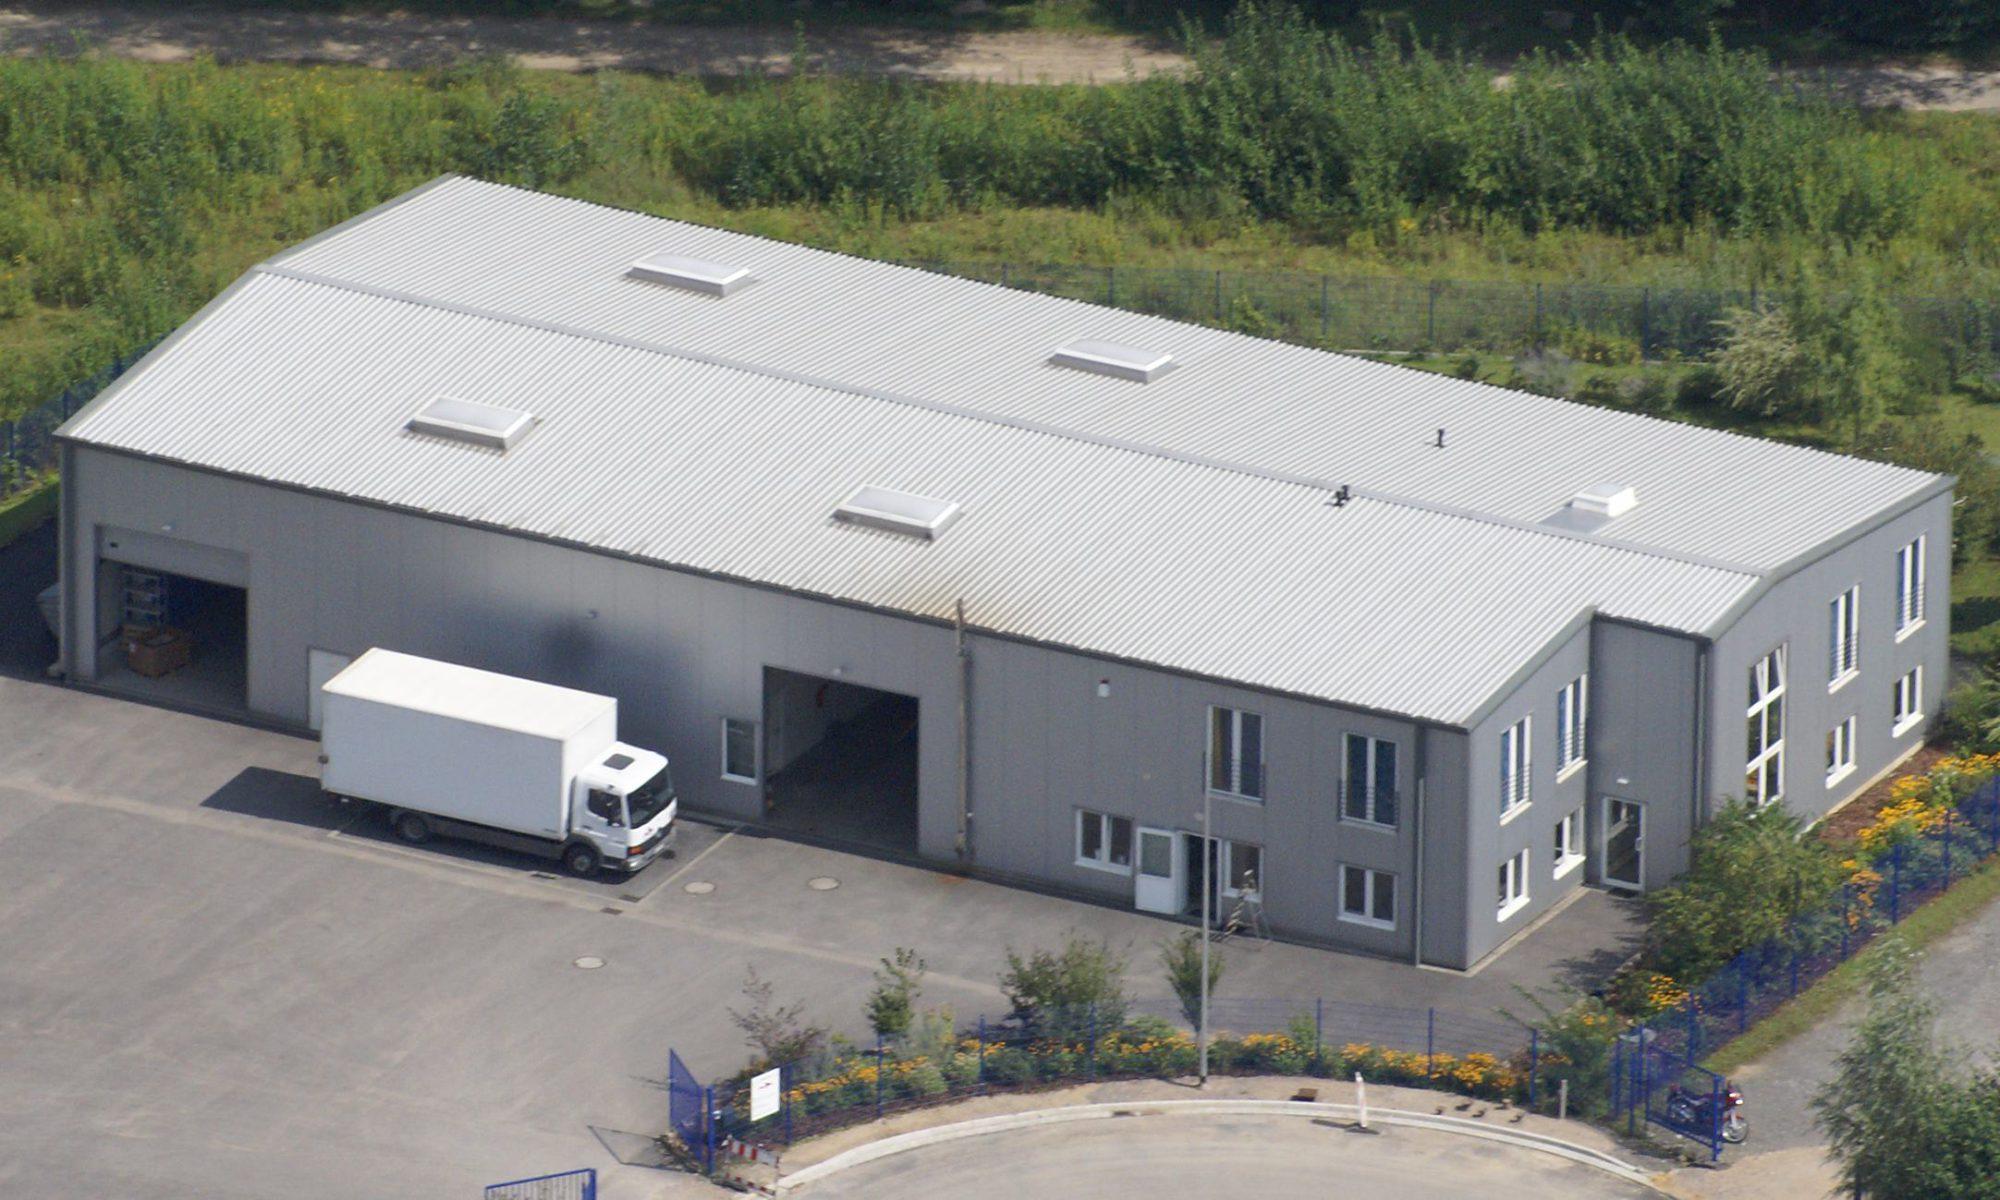 MeFo F.S.L. Full Service Logistic GmbH